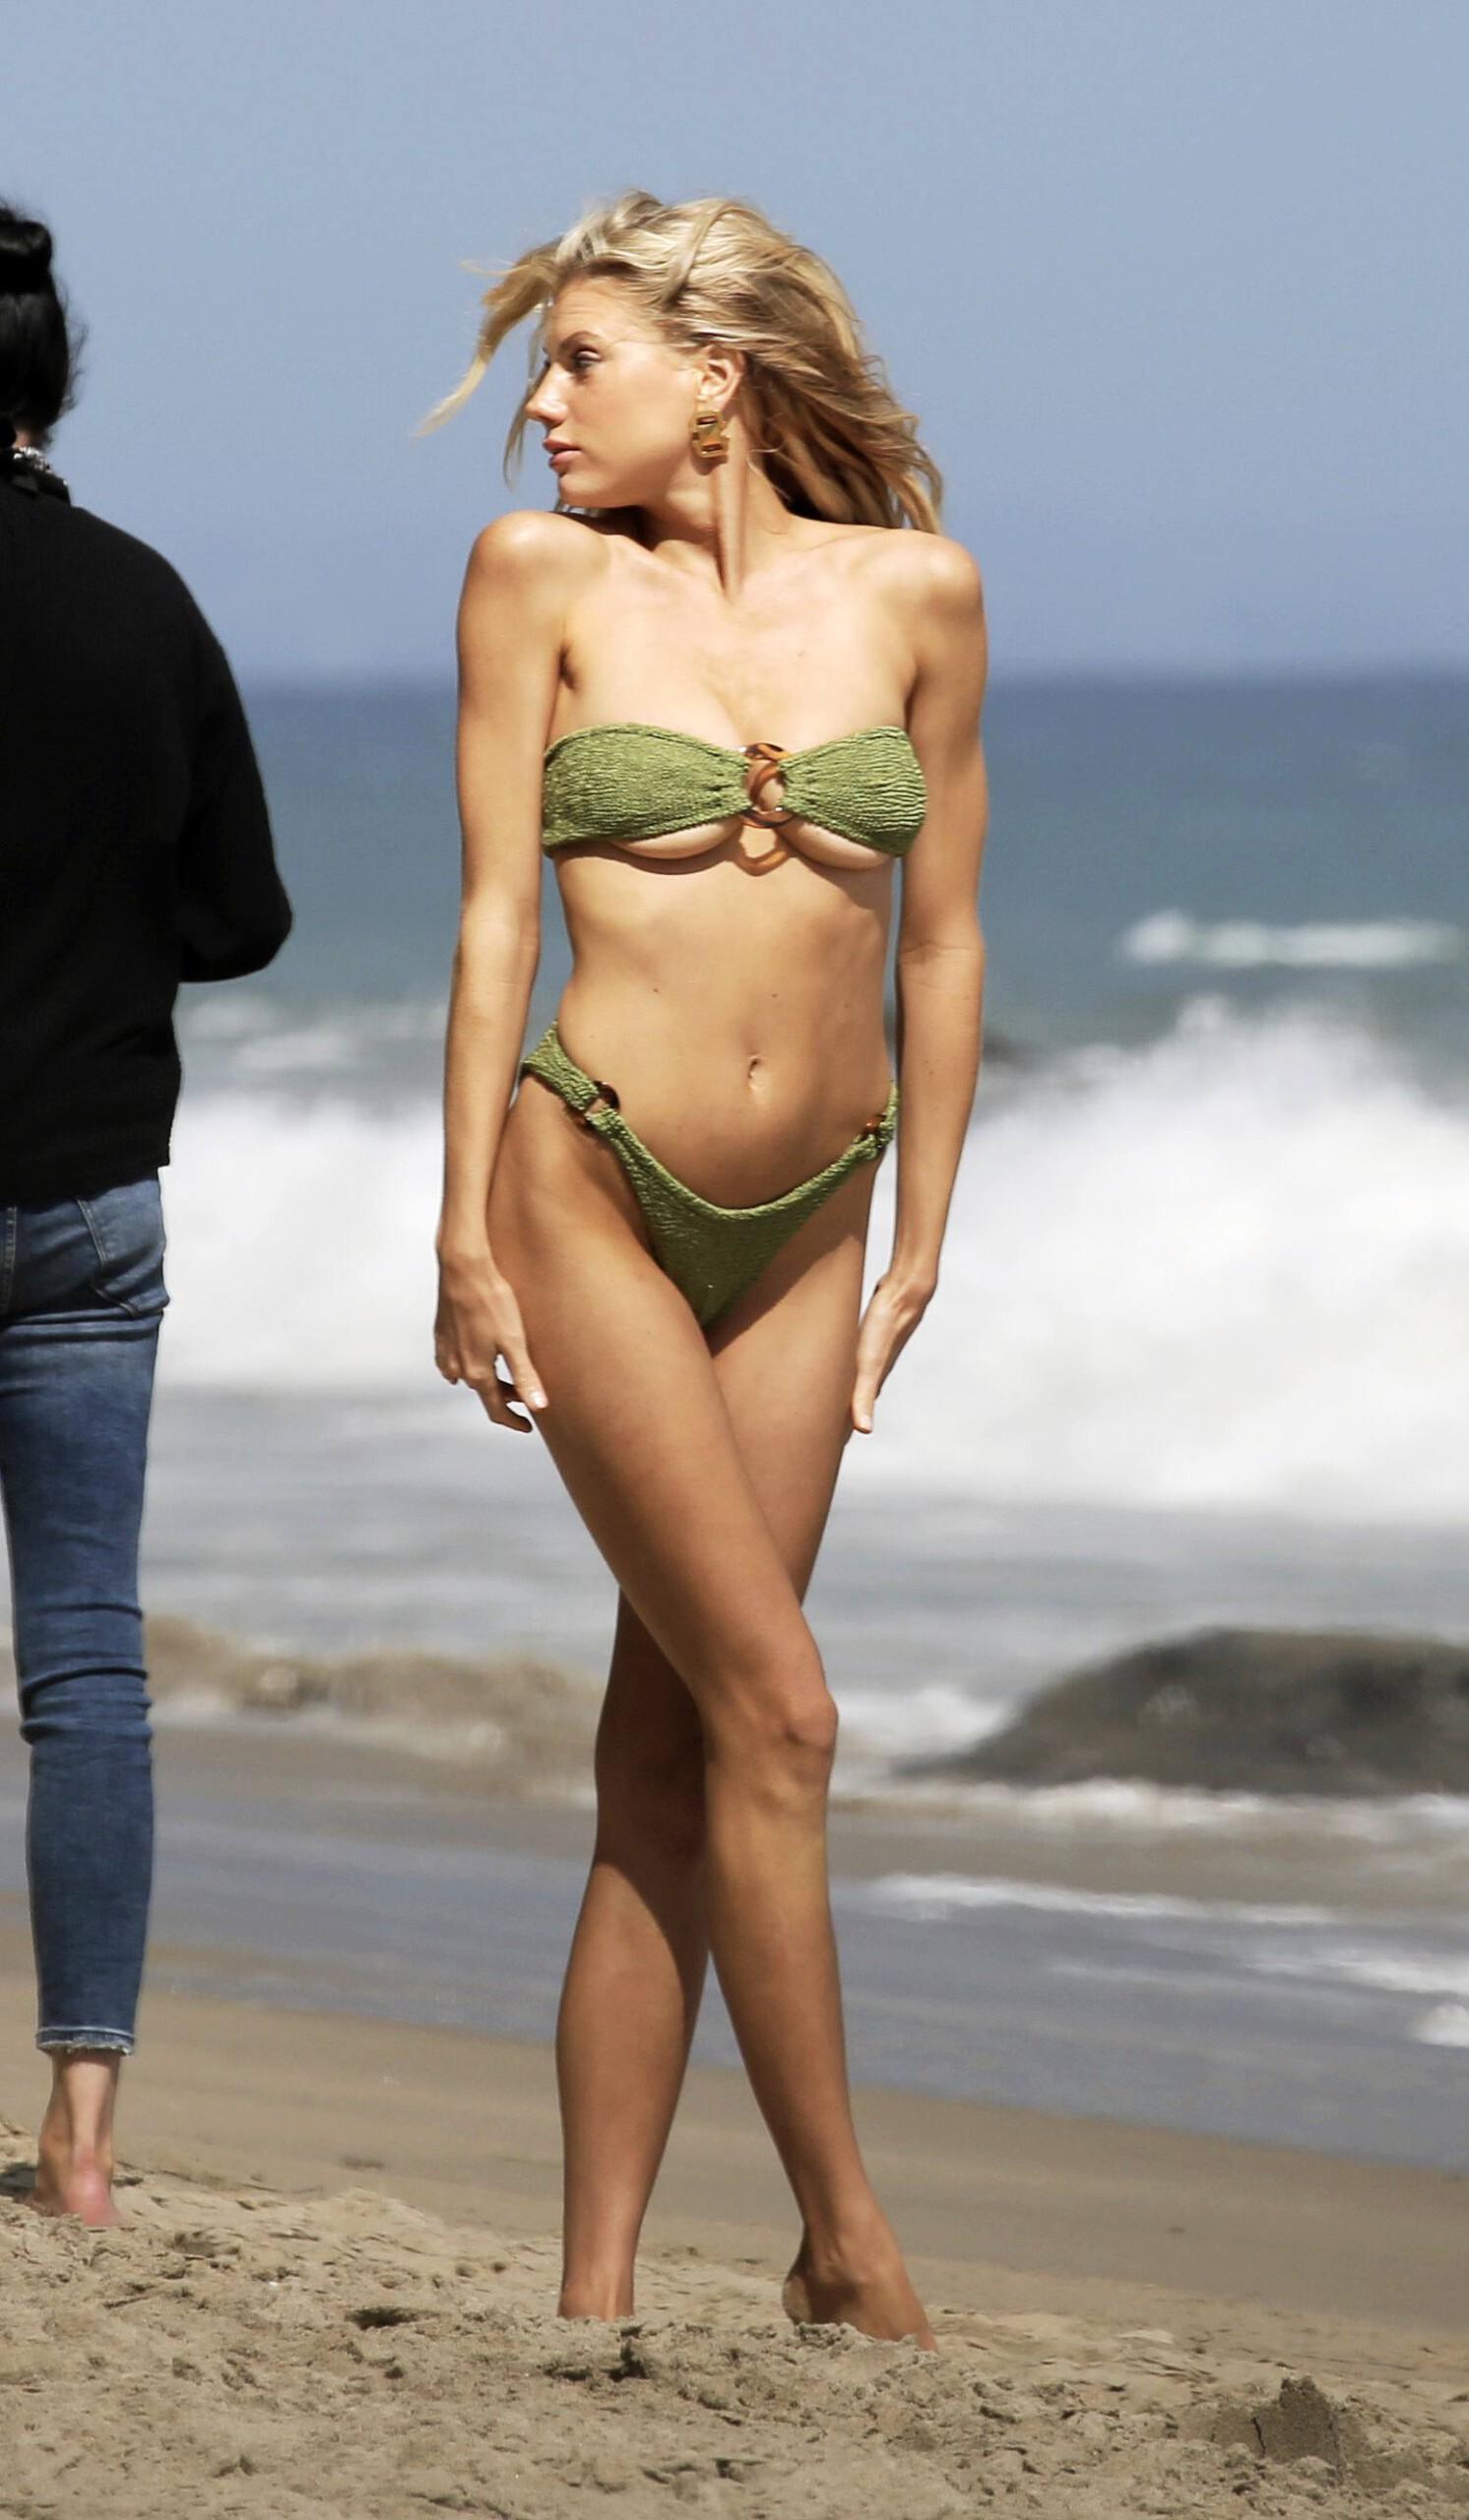 Charlotte Mckinney – Sexy Boobs In Tiny Bikini On The Beach In Los Angeles 0005